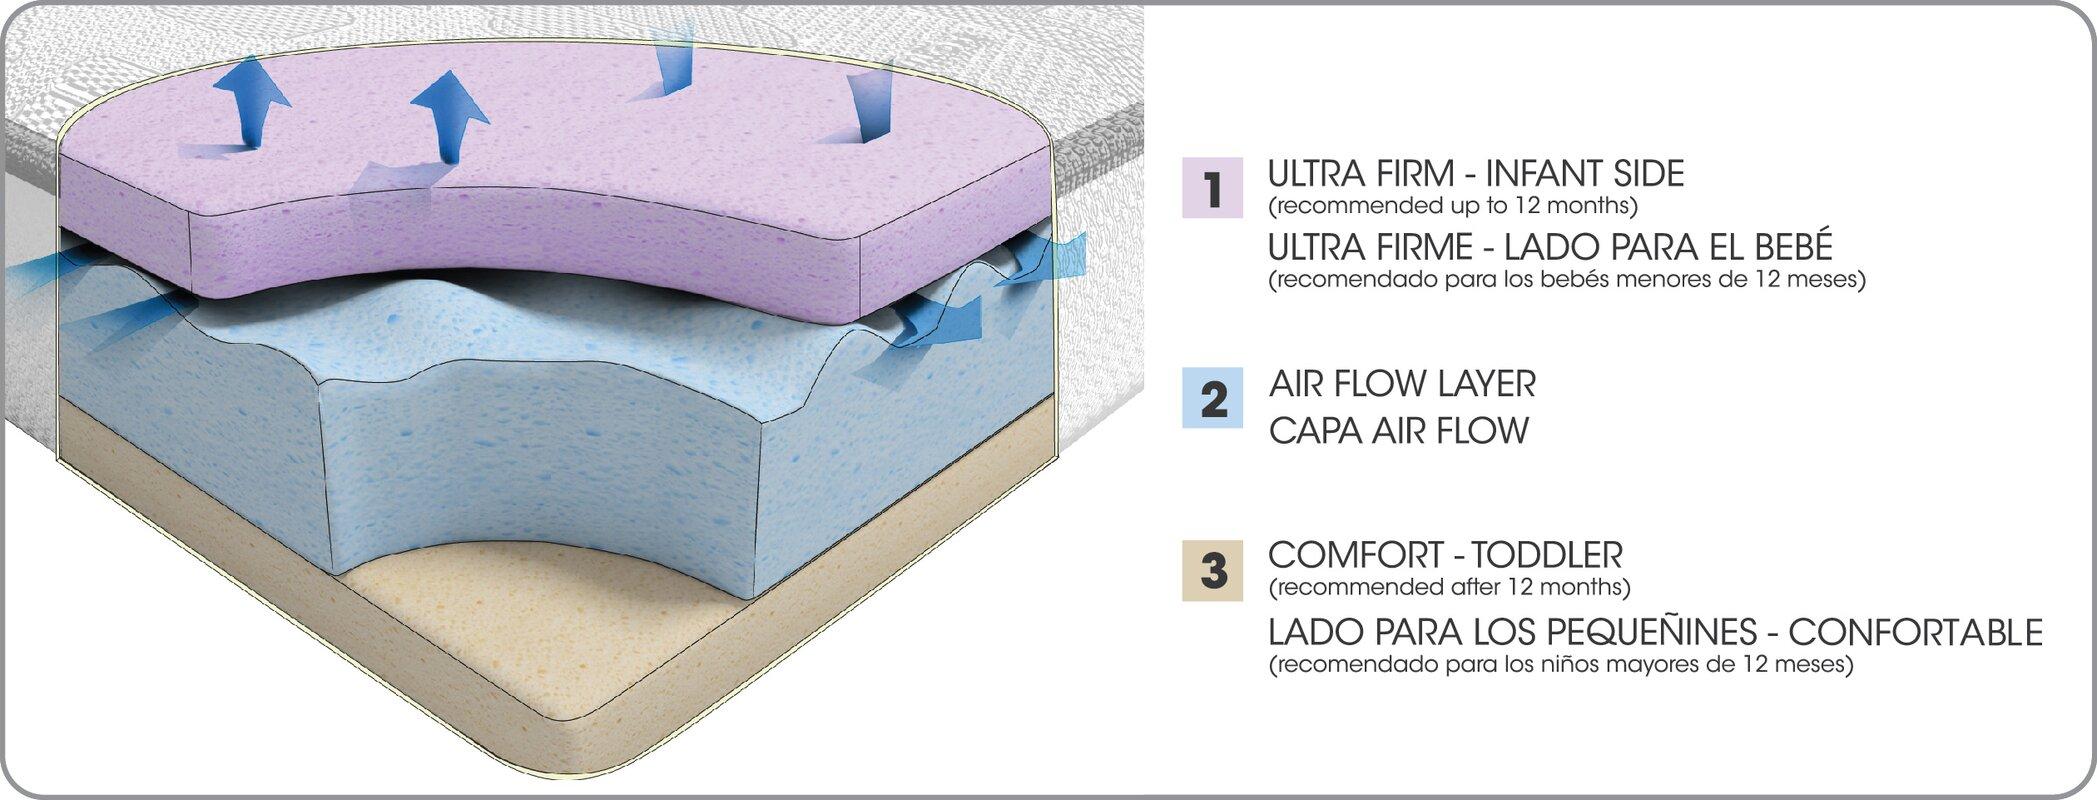 cotton innerspring crib pad lifekind organic certified standard mattress